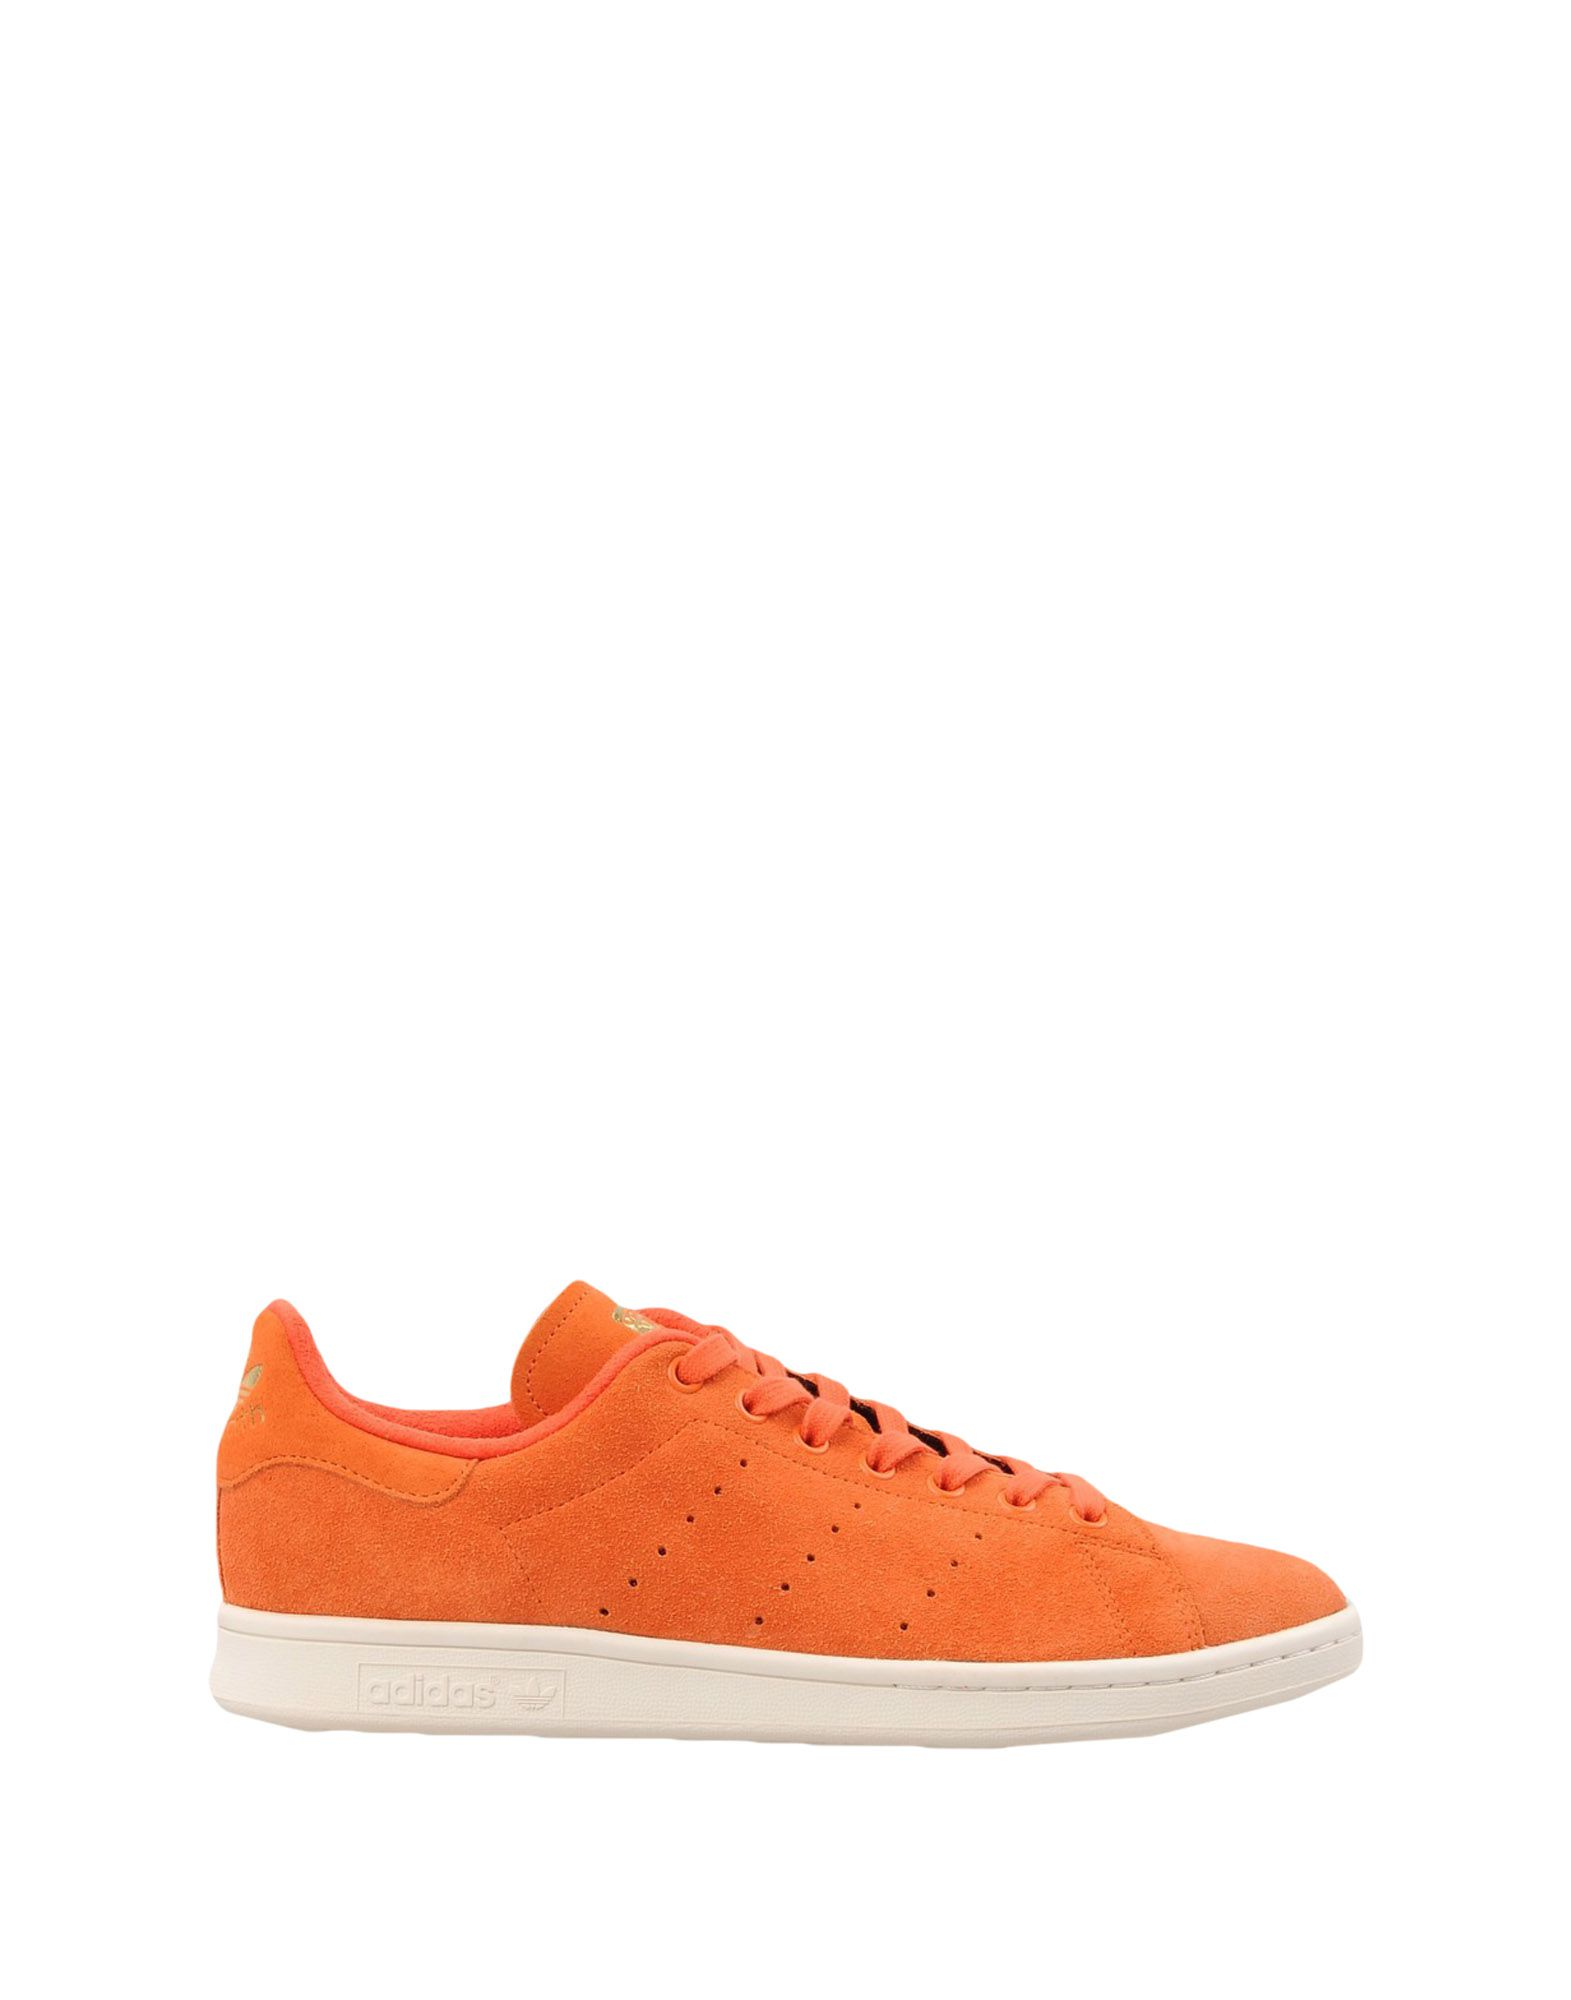 Adidas Originals Stan Smith   11286187XT 4609b9